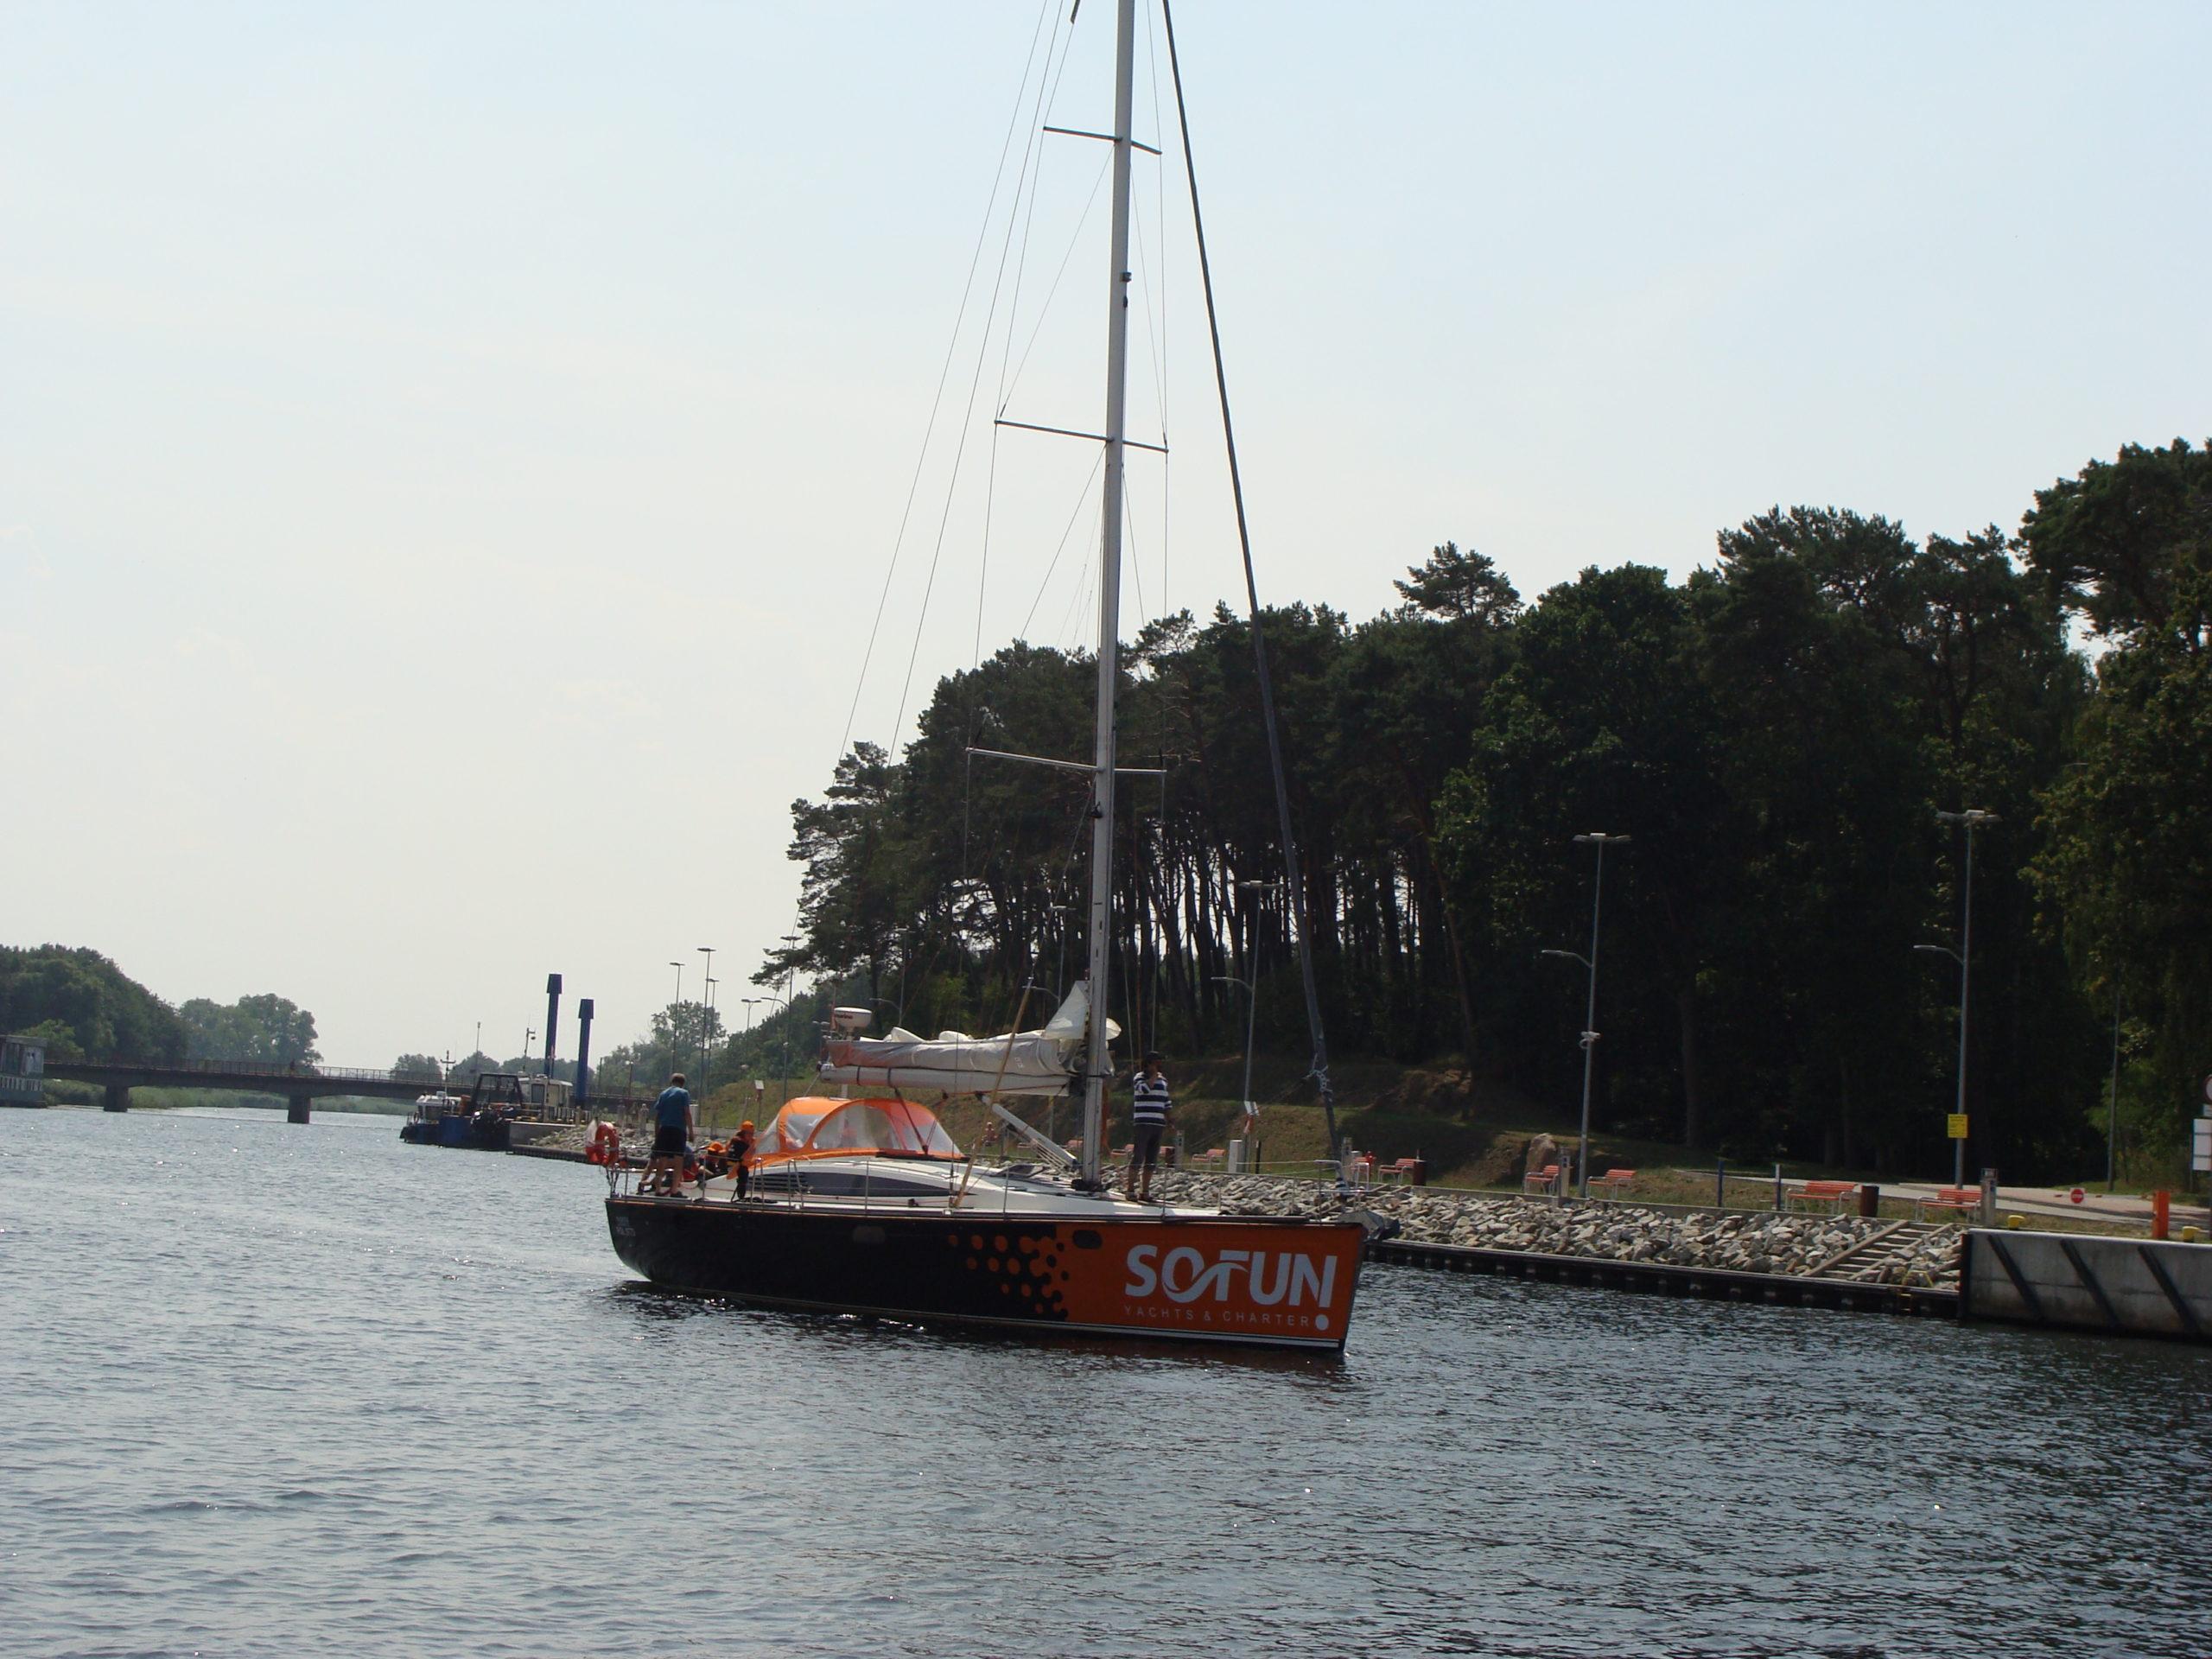 Jacht morski 4